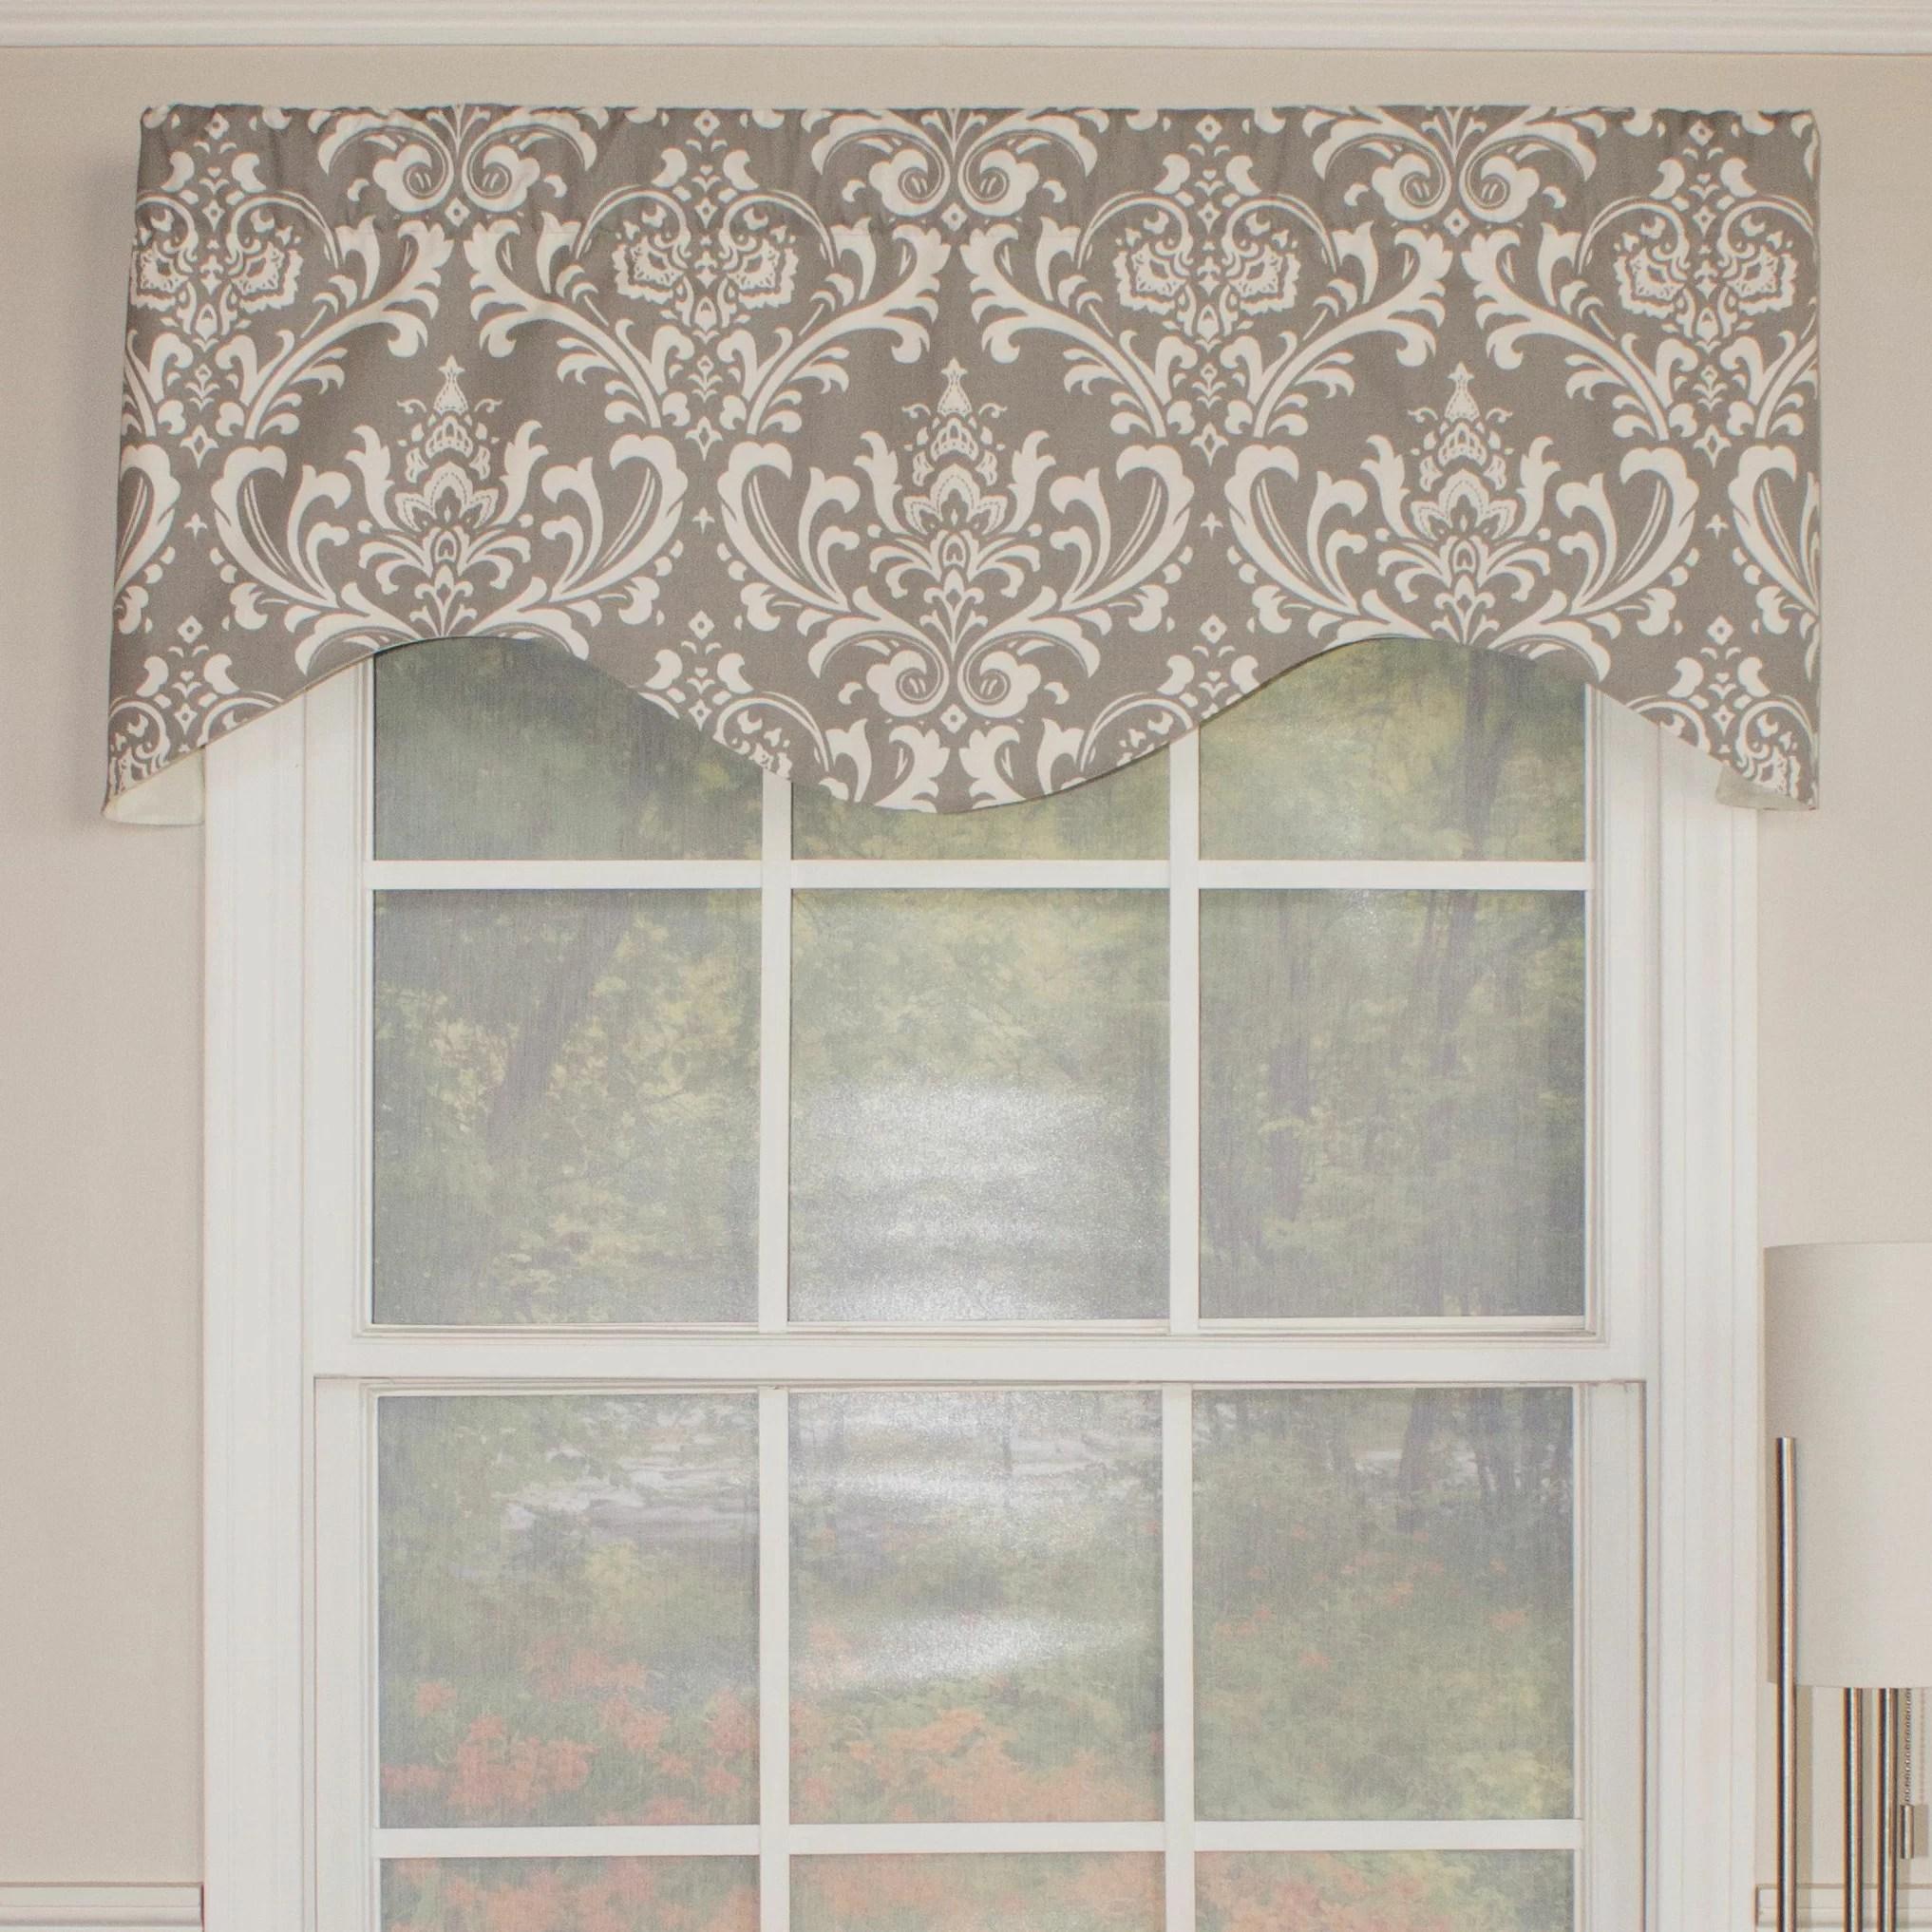 Rlf Home Royal Damask Cornice 50 Curtain Valance